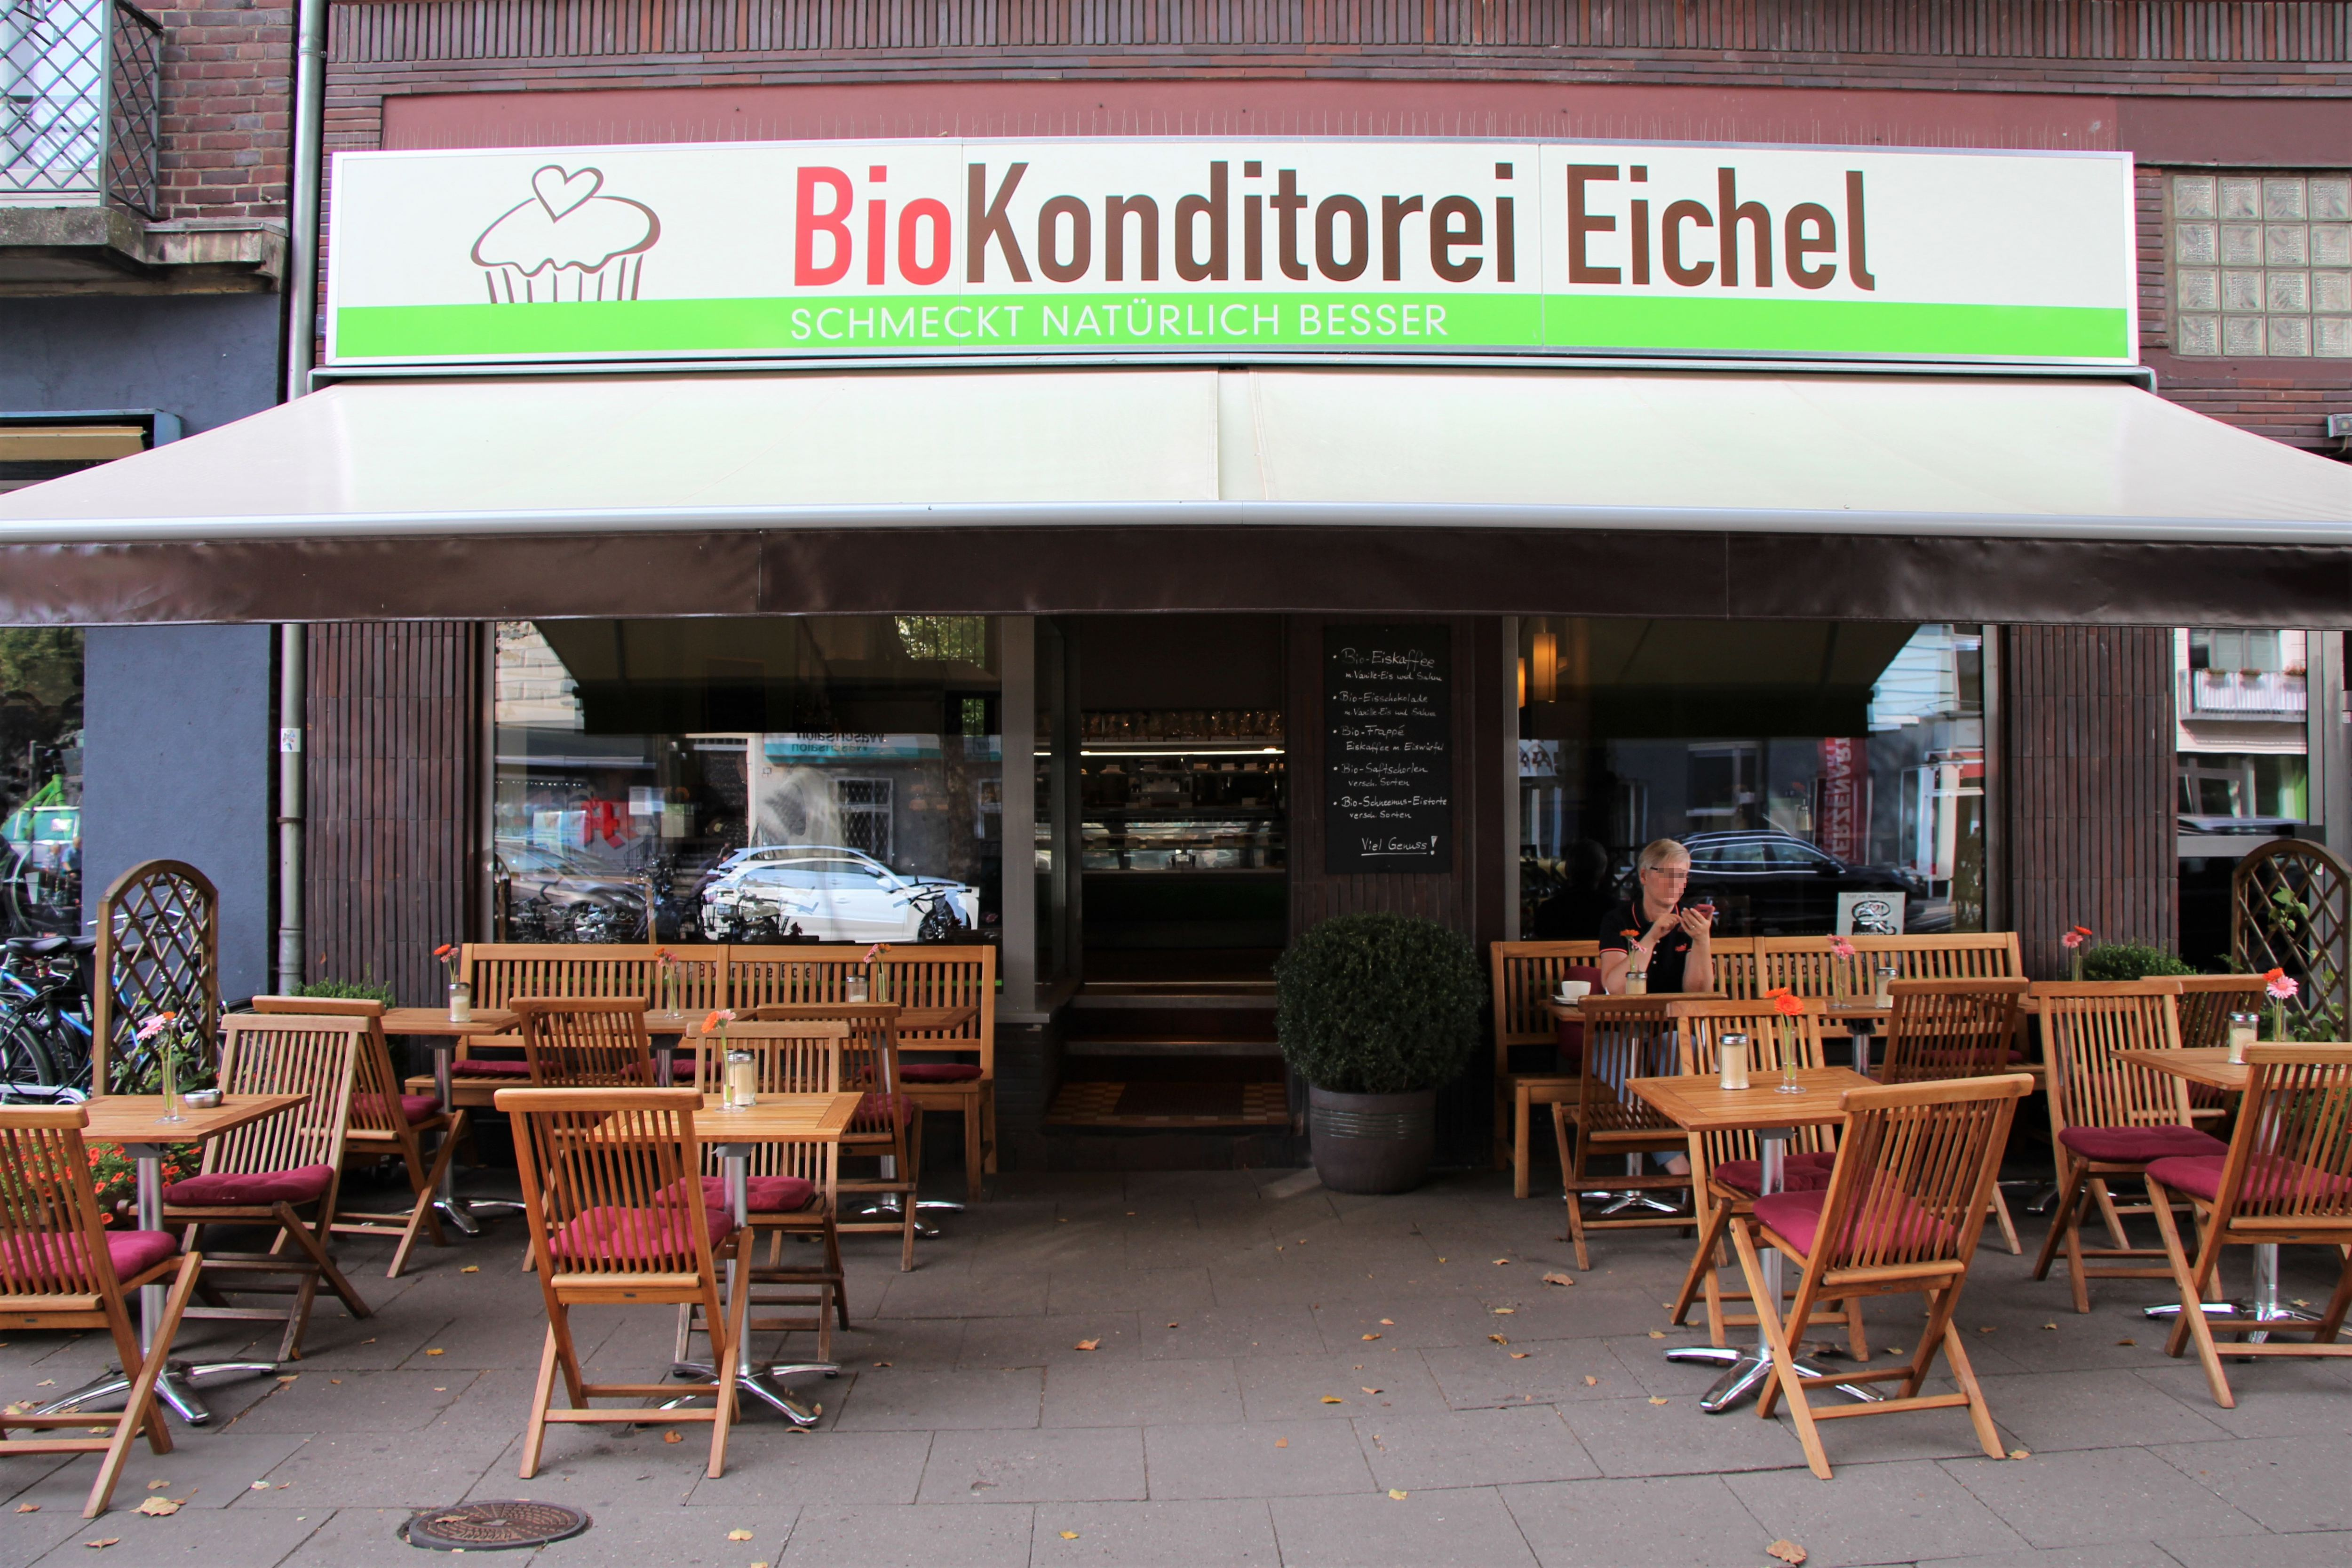 BioKonditorei Eichel